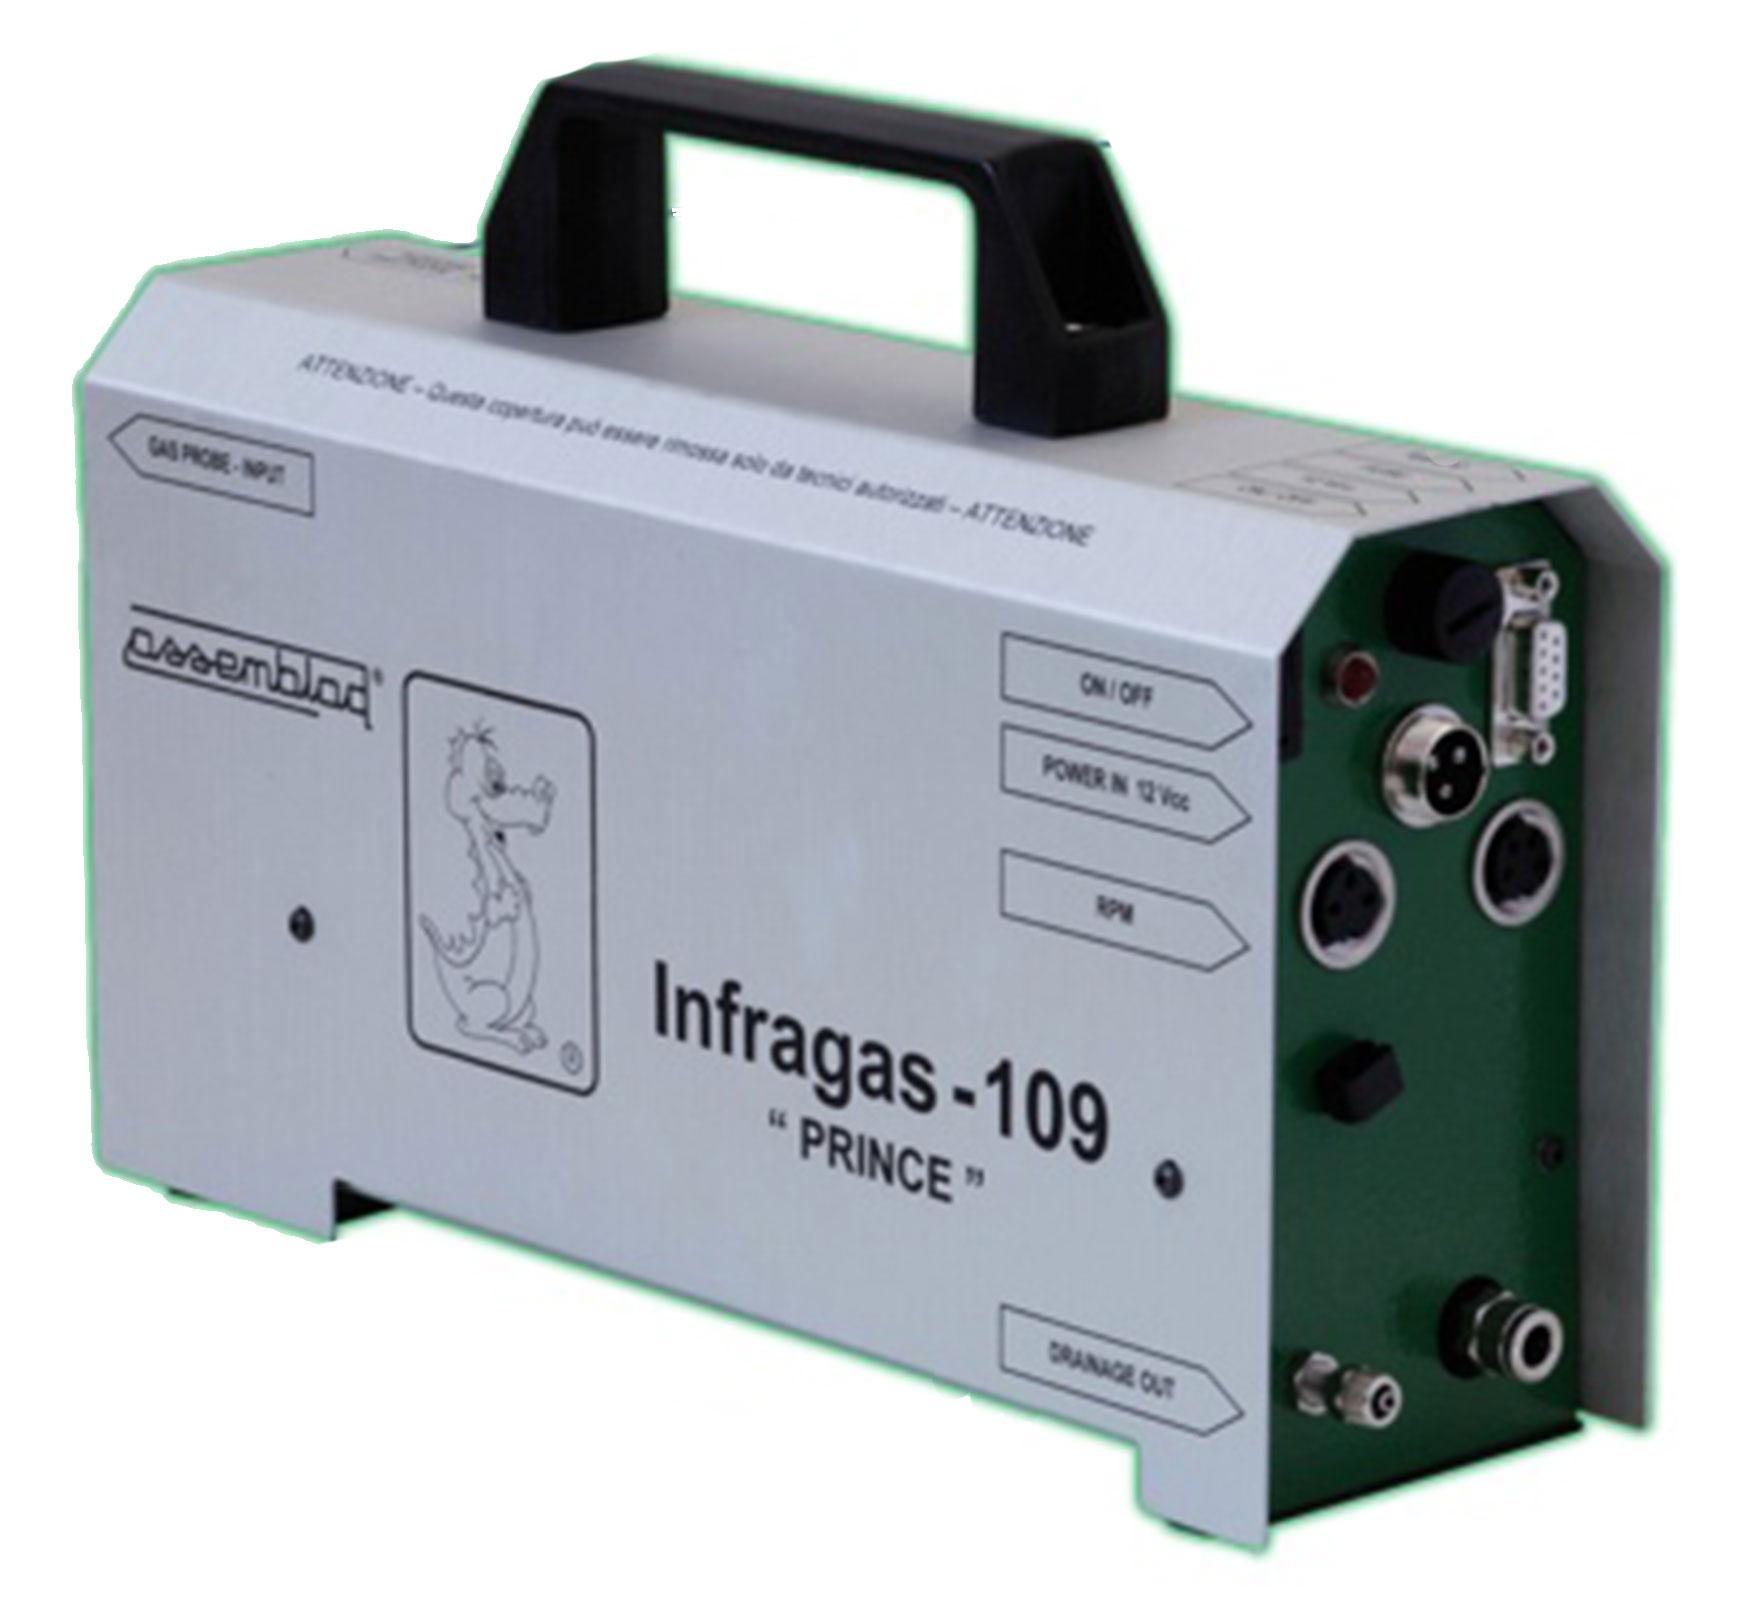 ANALIZADOR DE GASES DE ESCAPE INFRAGAS – 109